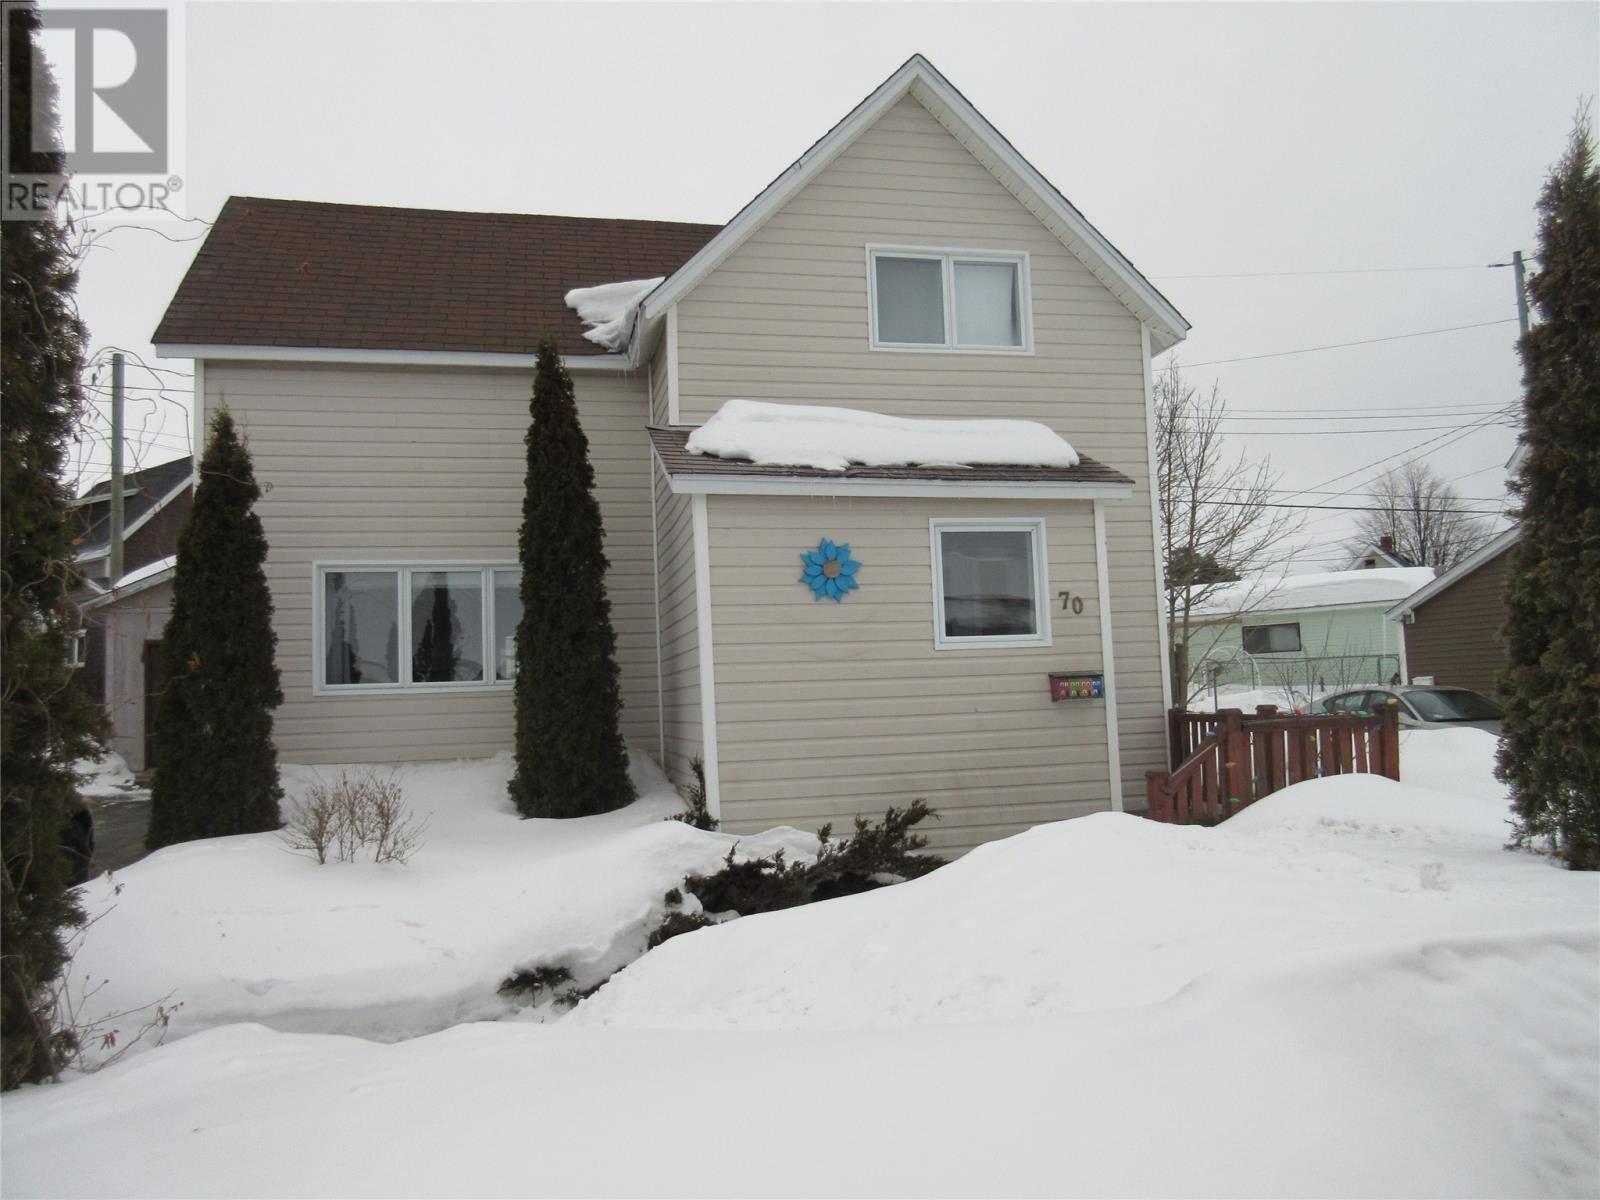 House for sale at 70 Circular Rd Grand Falls-windsor Newfoundland - MLS: 1211906